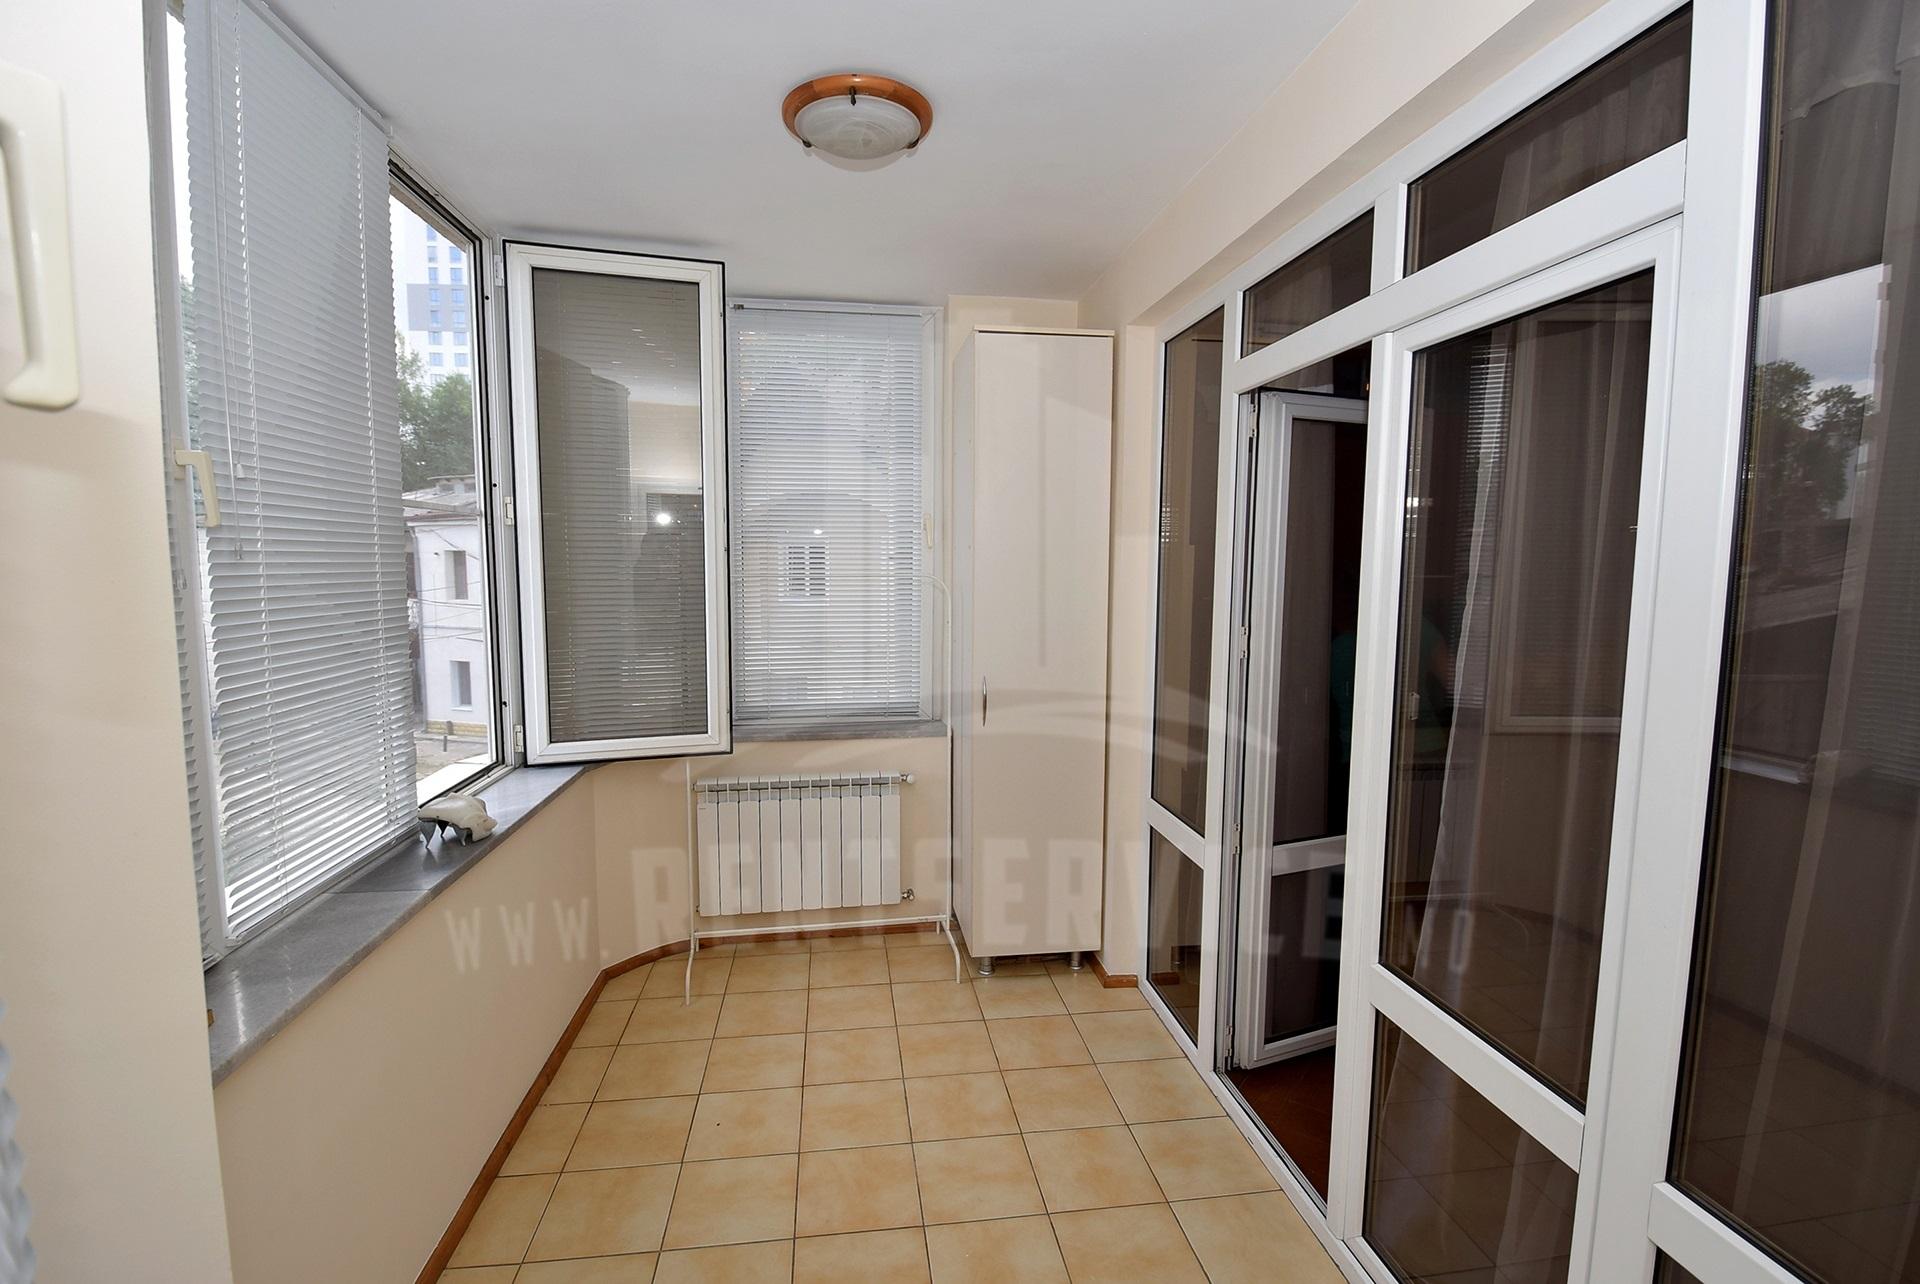 2064_apartment_6.jpg